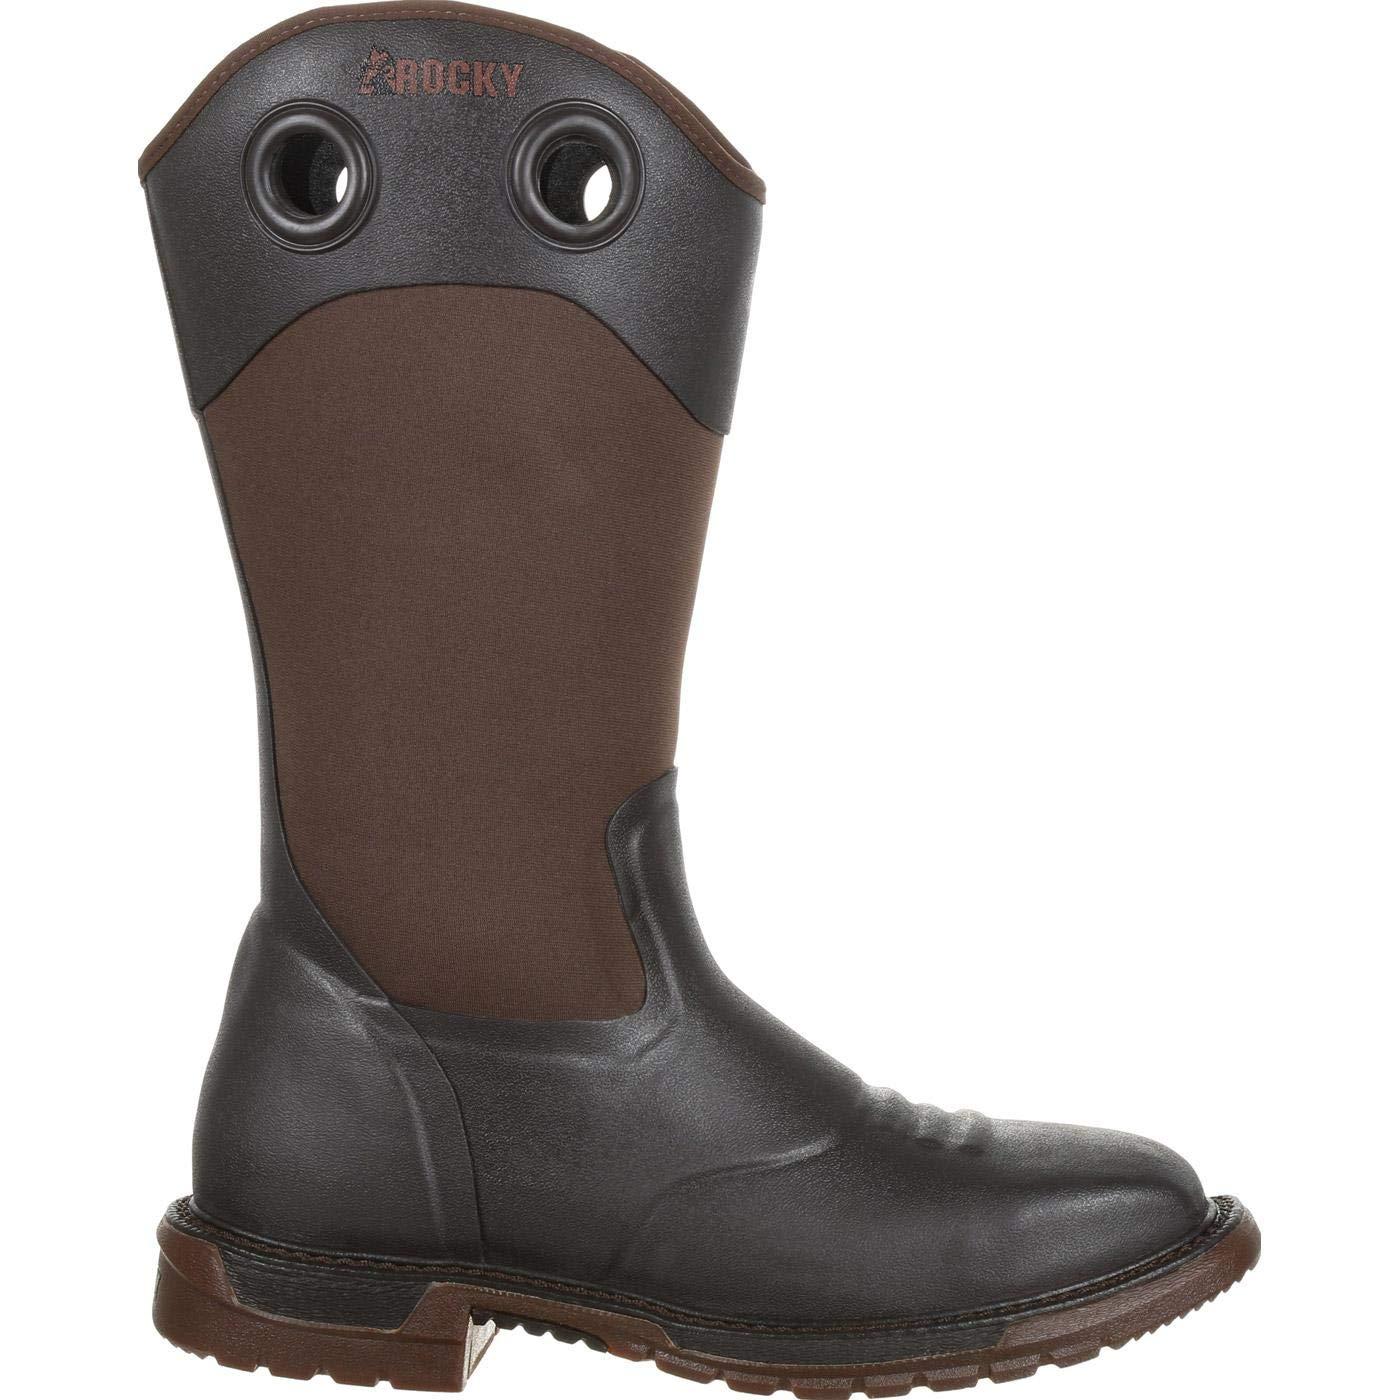 b4c2559d05b ROCKY Men's Original Ride FLX Waterproof Western Work Boot Steel Toe